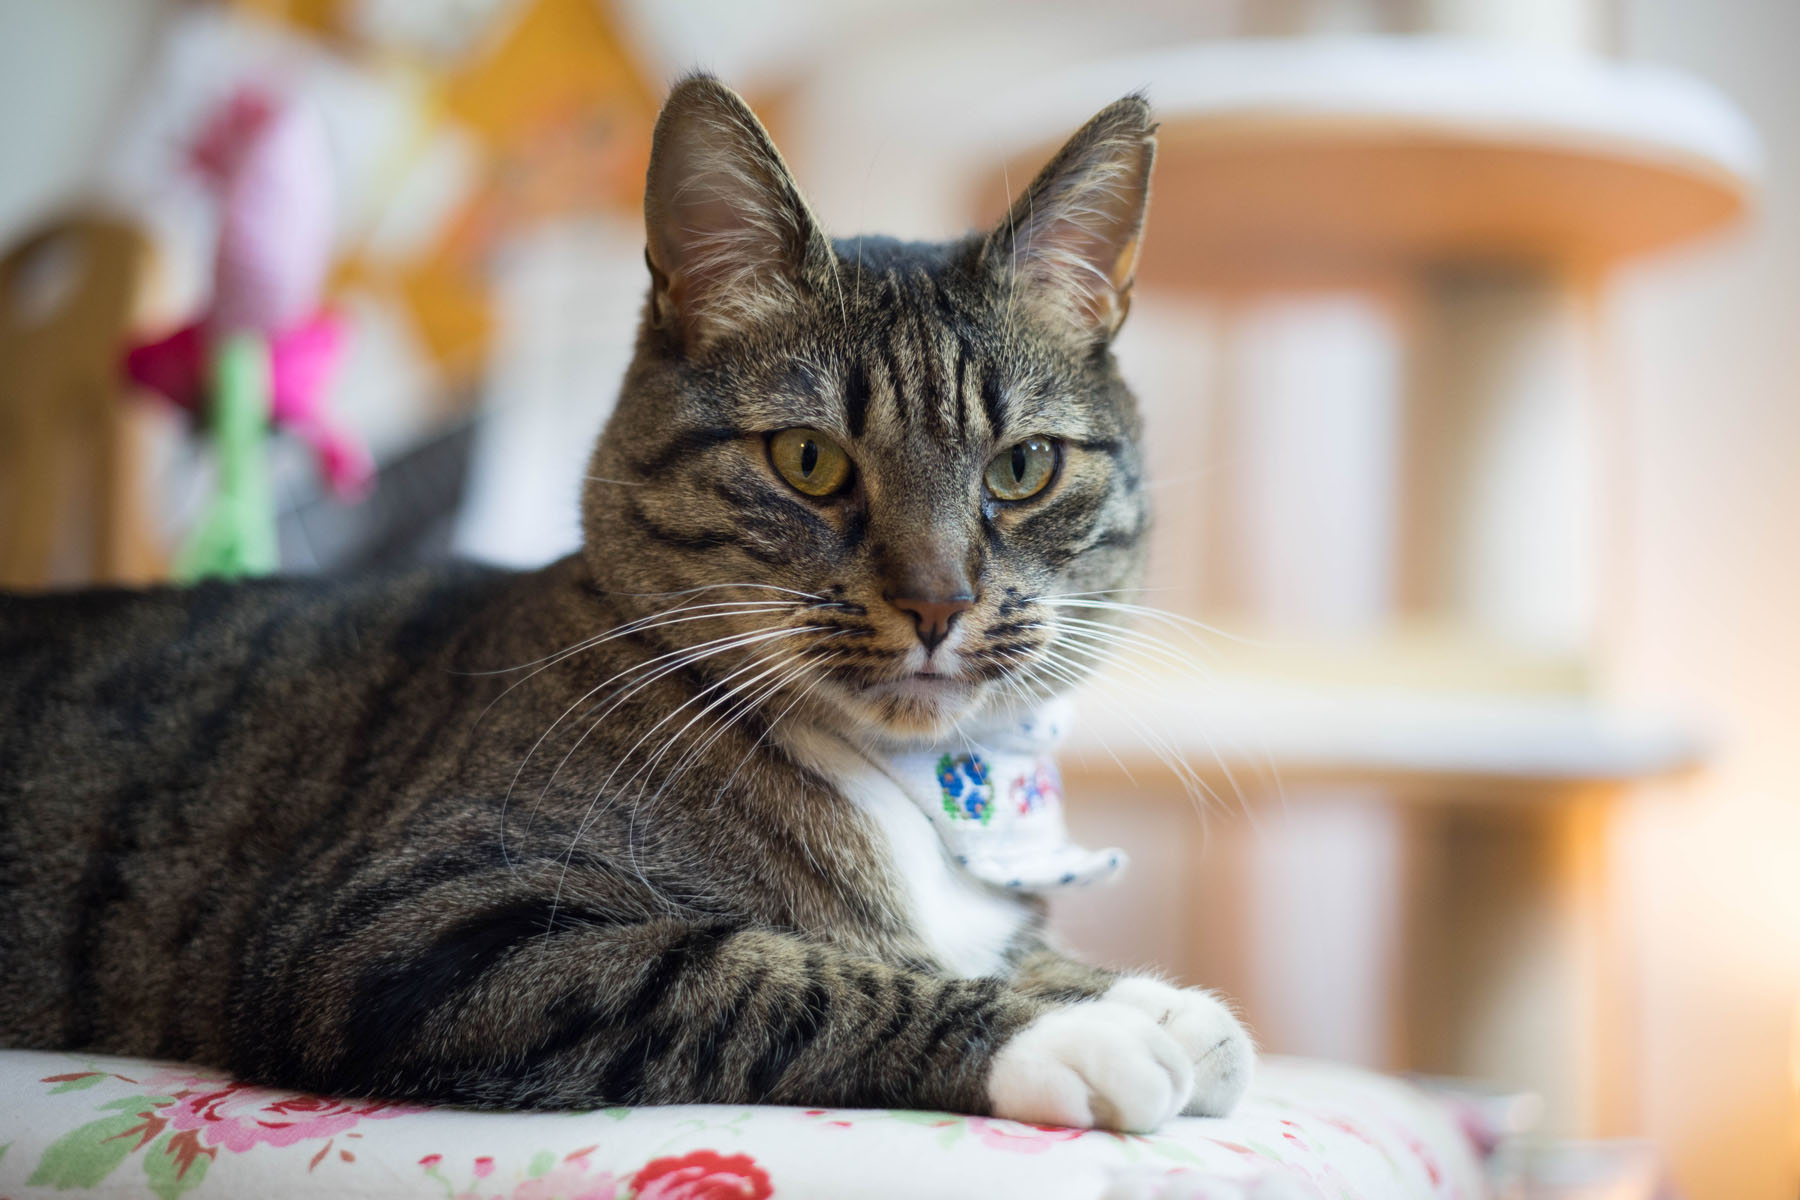 Good deal: Amazon Pet Festival deals for cat owners